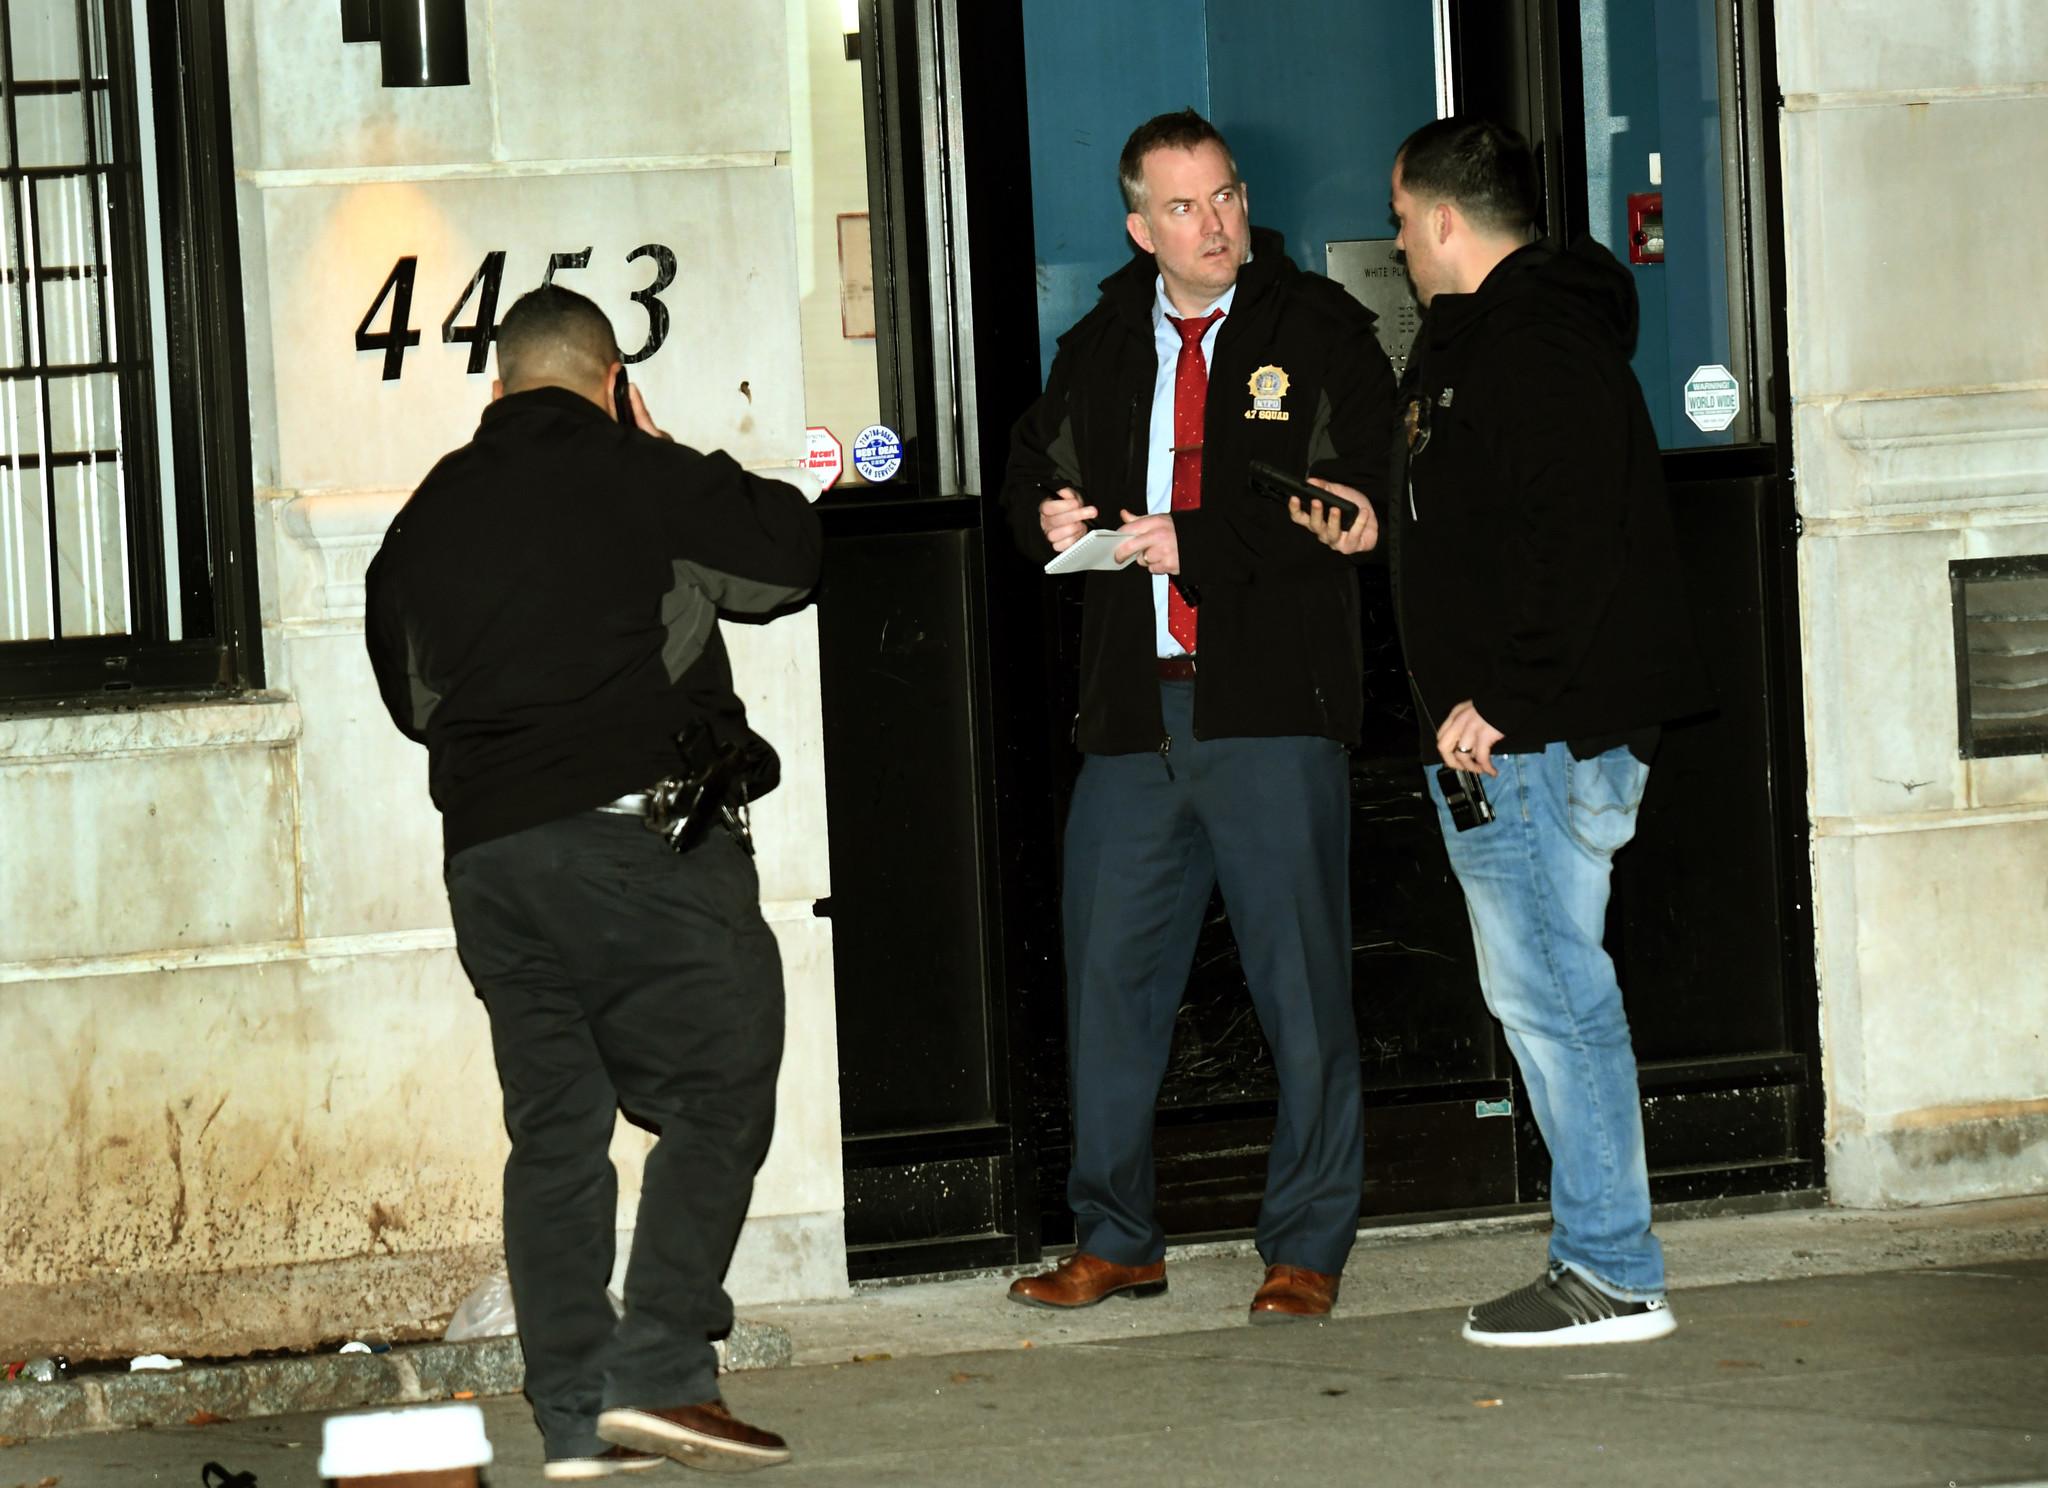 Man found fatally shot in lobby of Bronx building